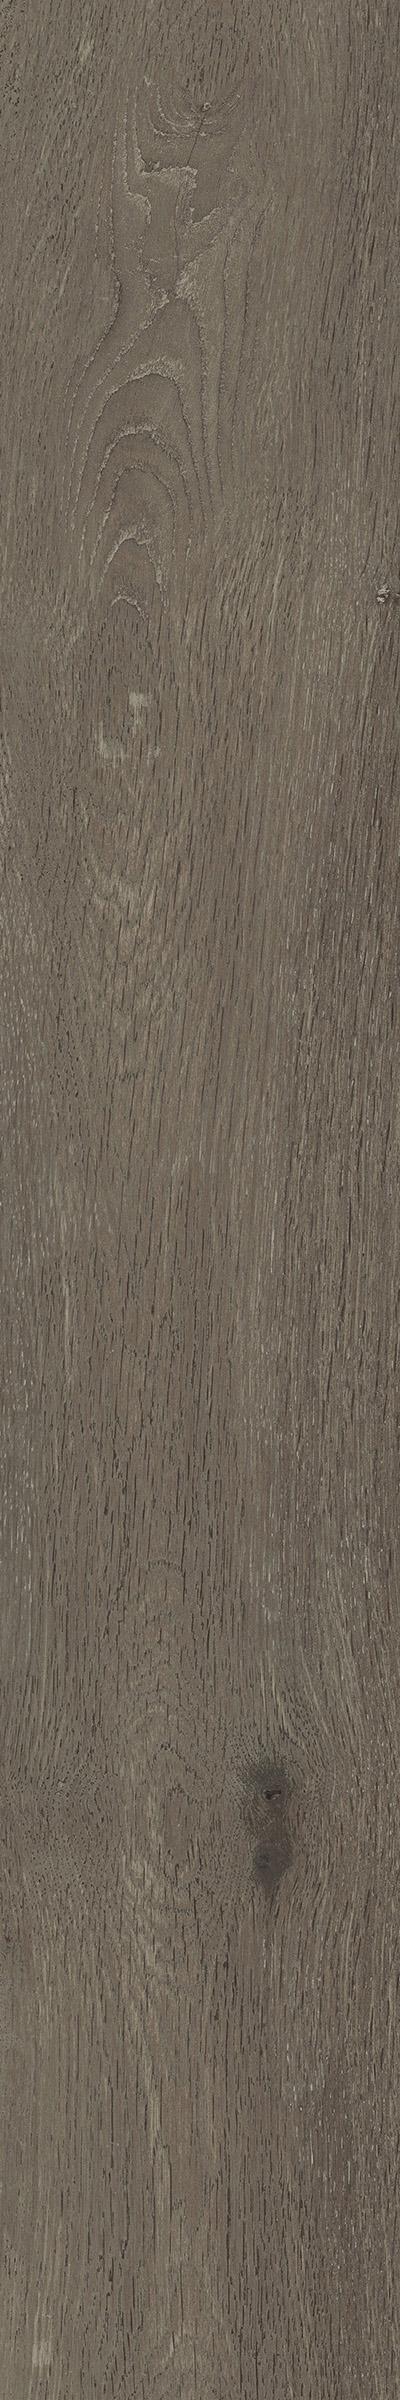 Naples-Bruin-20x120